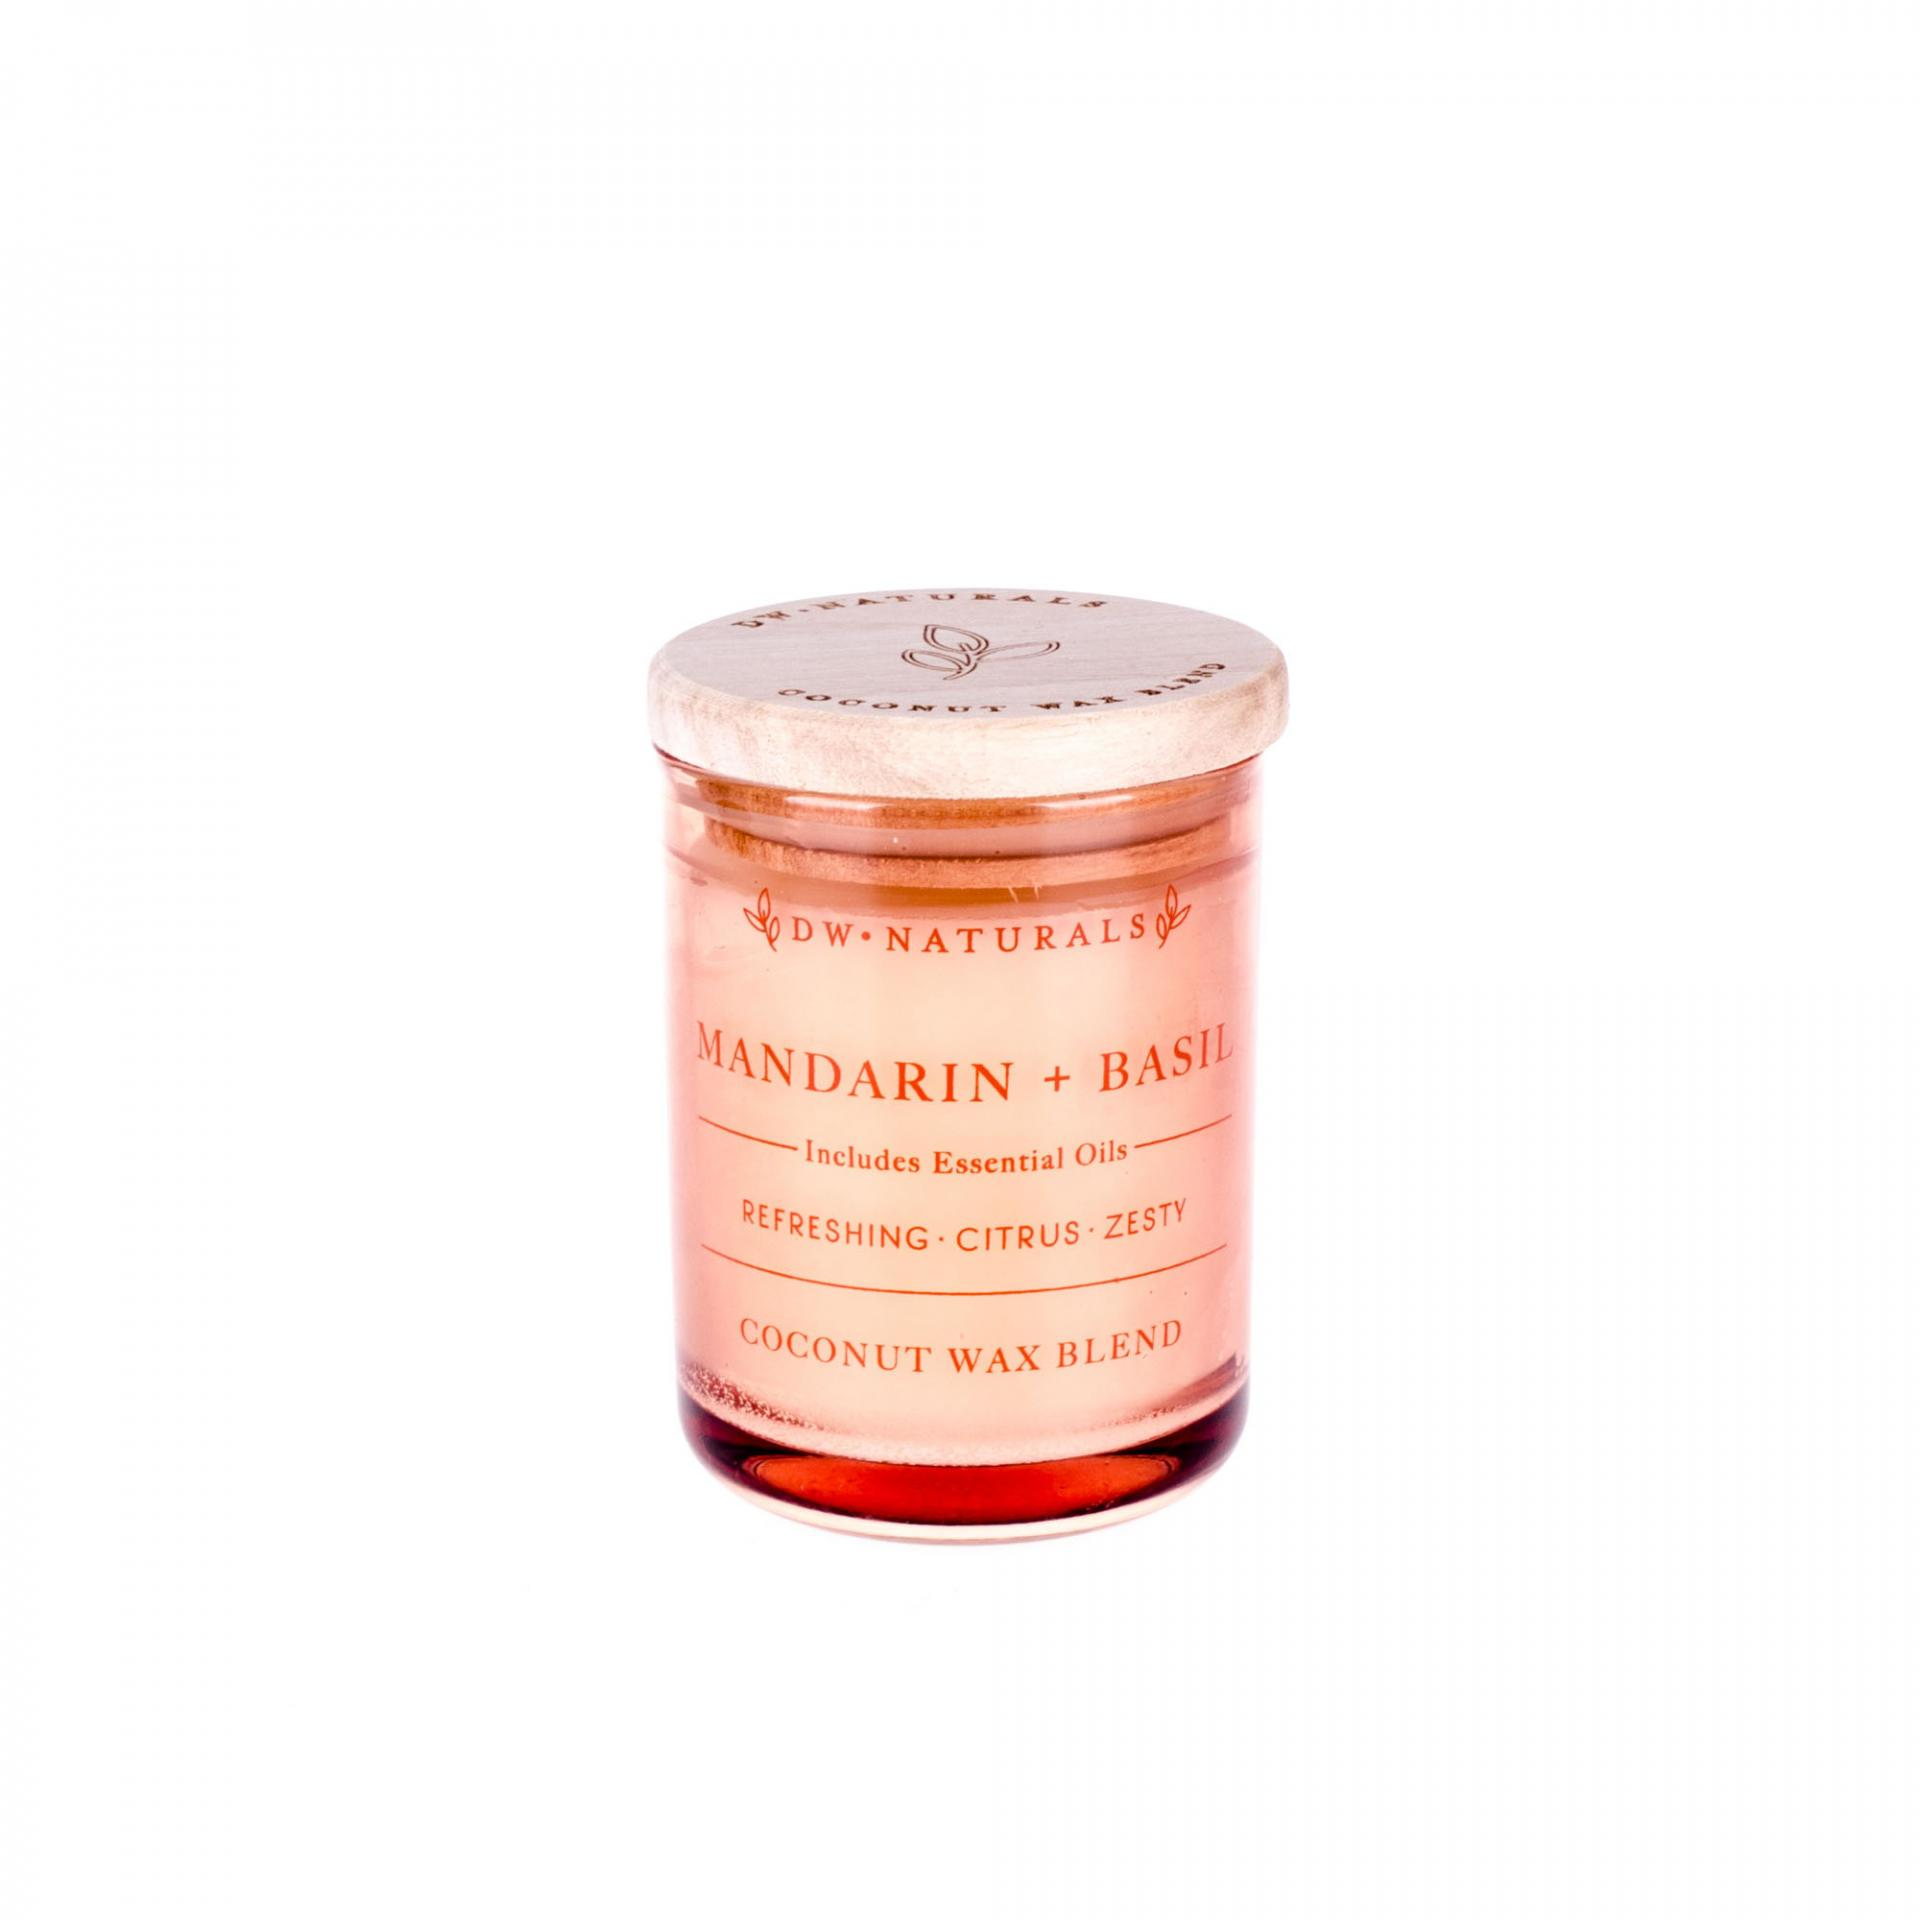 dw HOME Mini vonná svíčka Mandarinka s Bazalkou - 103gr, oranžová barva, sklo, dřevo